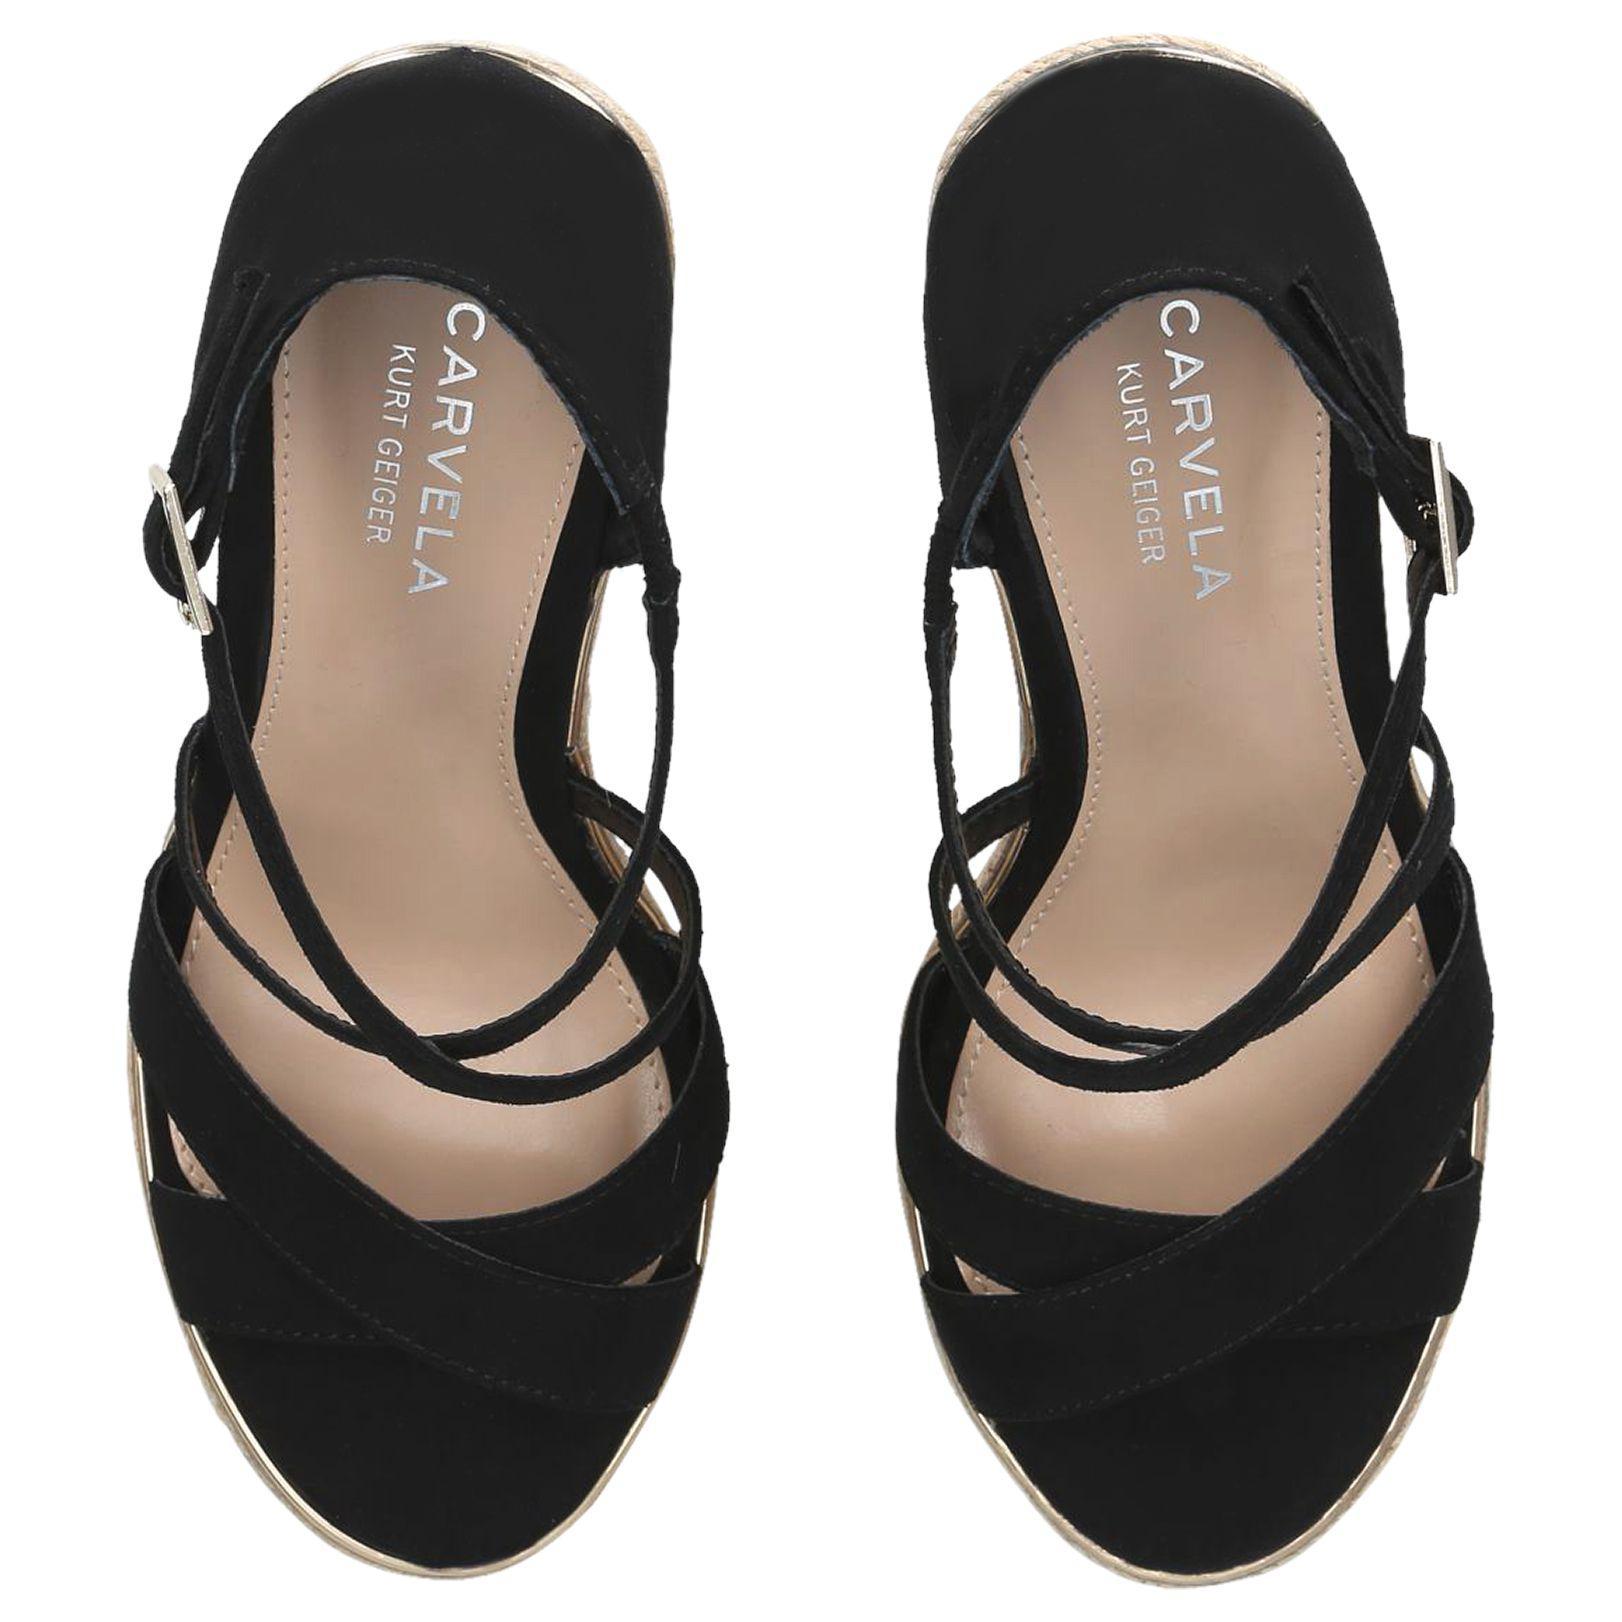 97ddb2c9b07 Carvela Kurt Geiger - Black Sublime Wedge Heel Sandals - Lyst. View  fullscreen